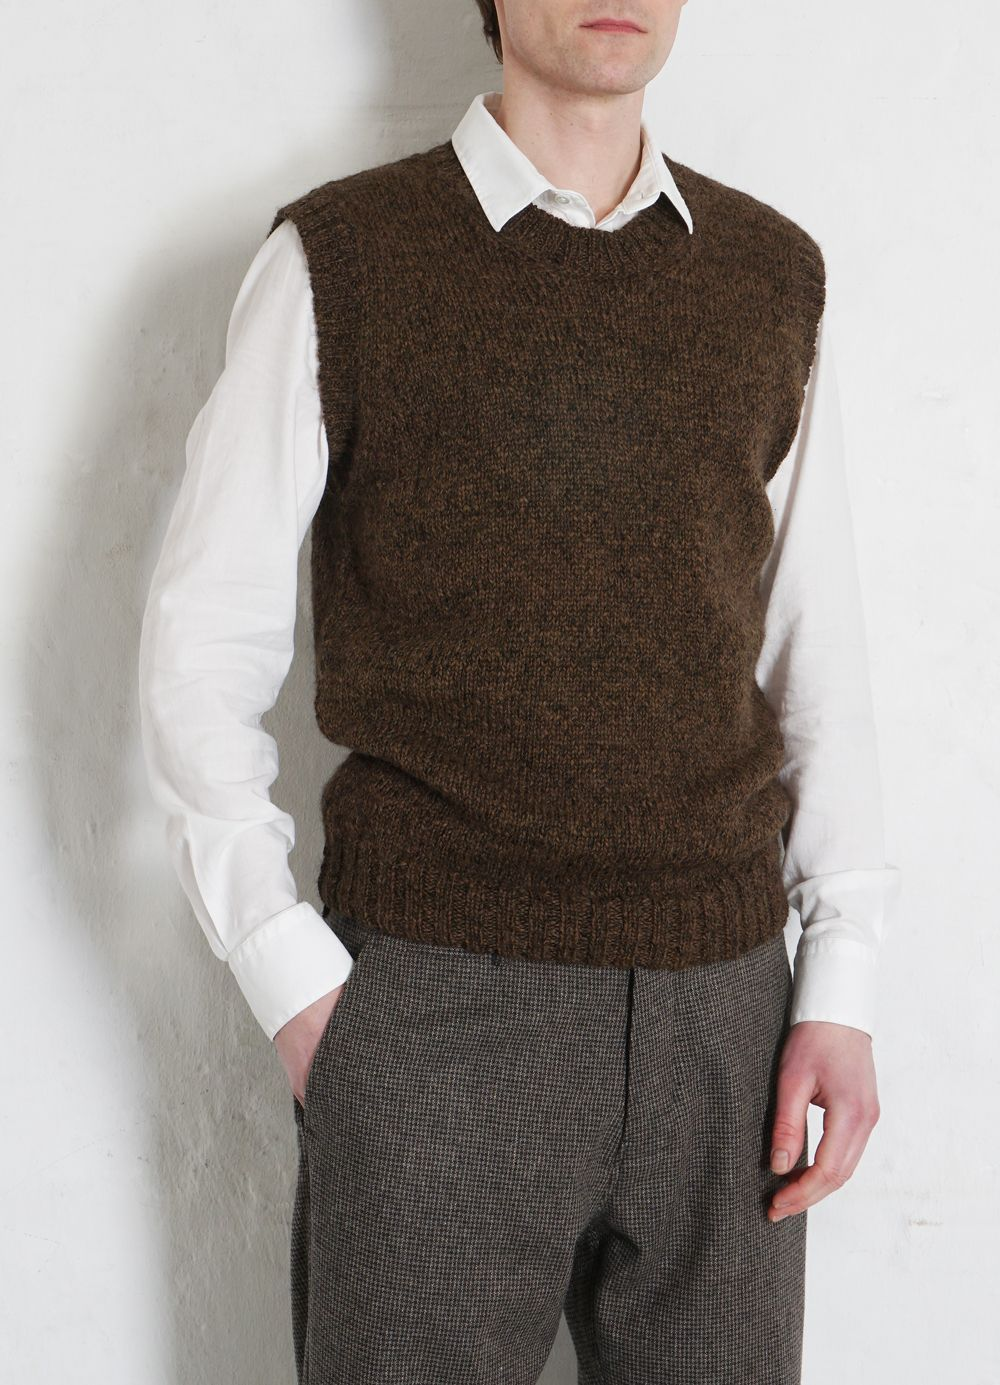 Hansen Garments MOGENS | Knitted Crew Neck Vest | tobacco